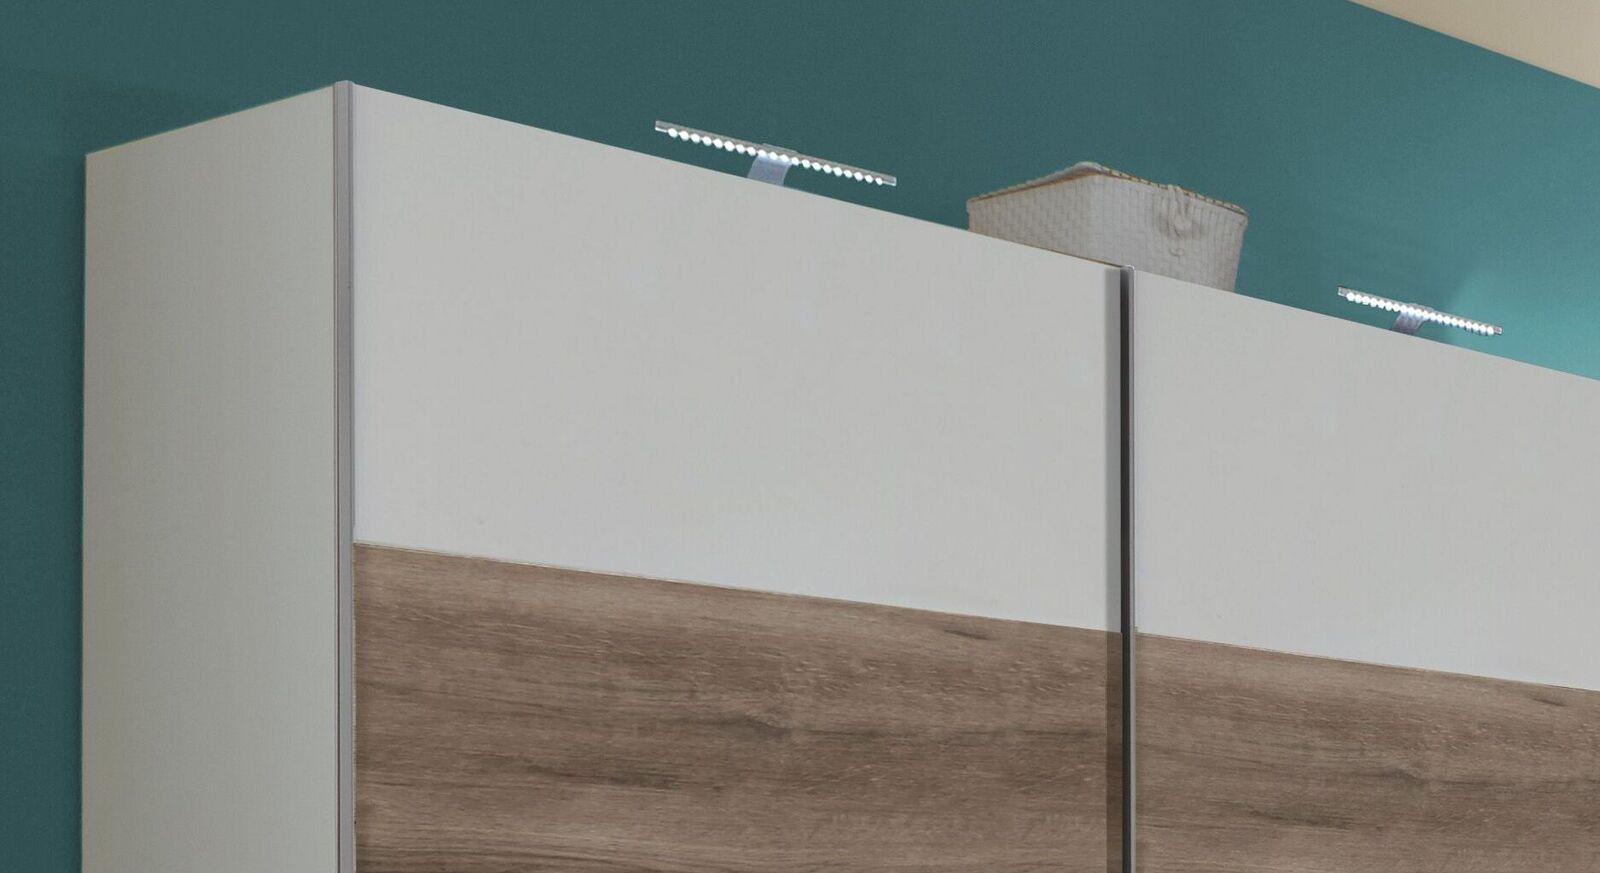 Schwebetüren-Kleiderschrank Kenva mit optionaler Beleuchtung